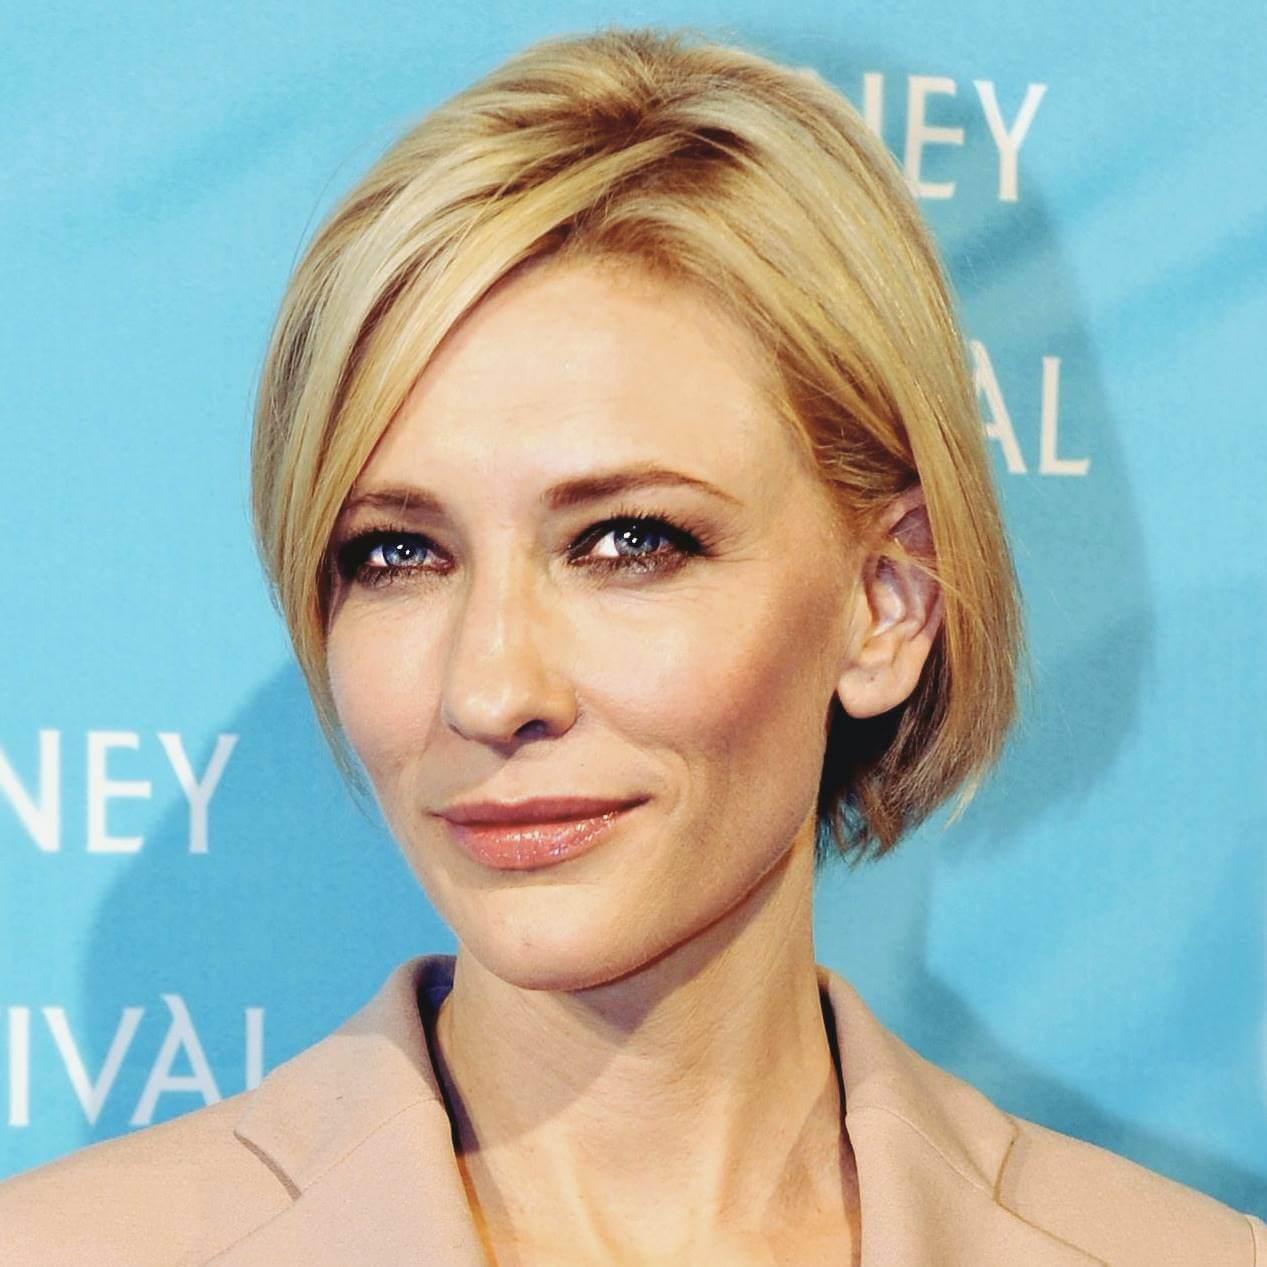 Catherine Elise Blanchett